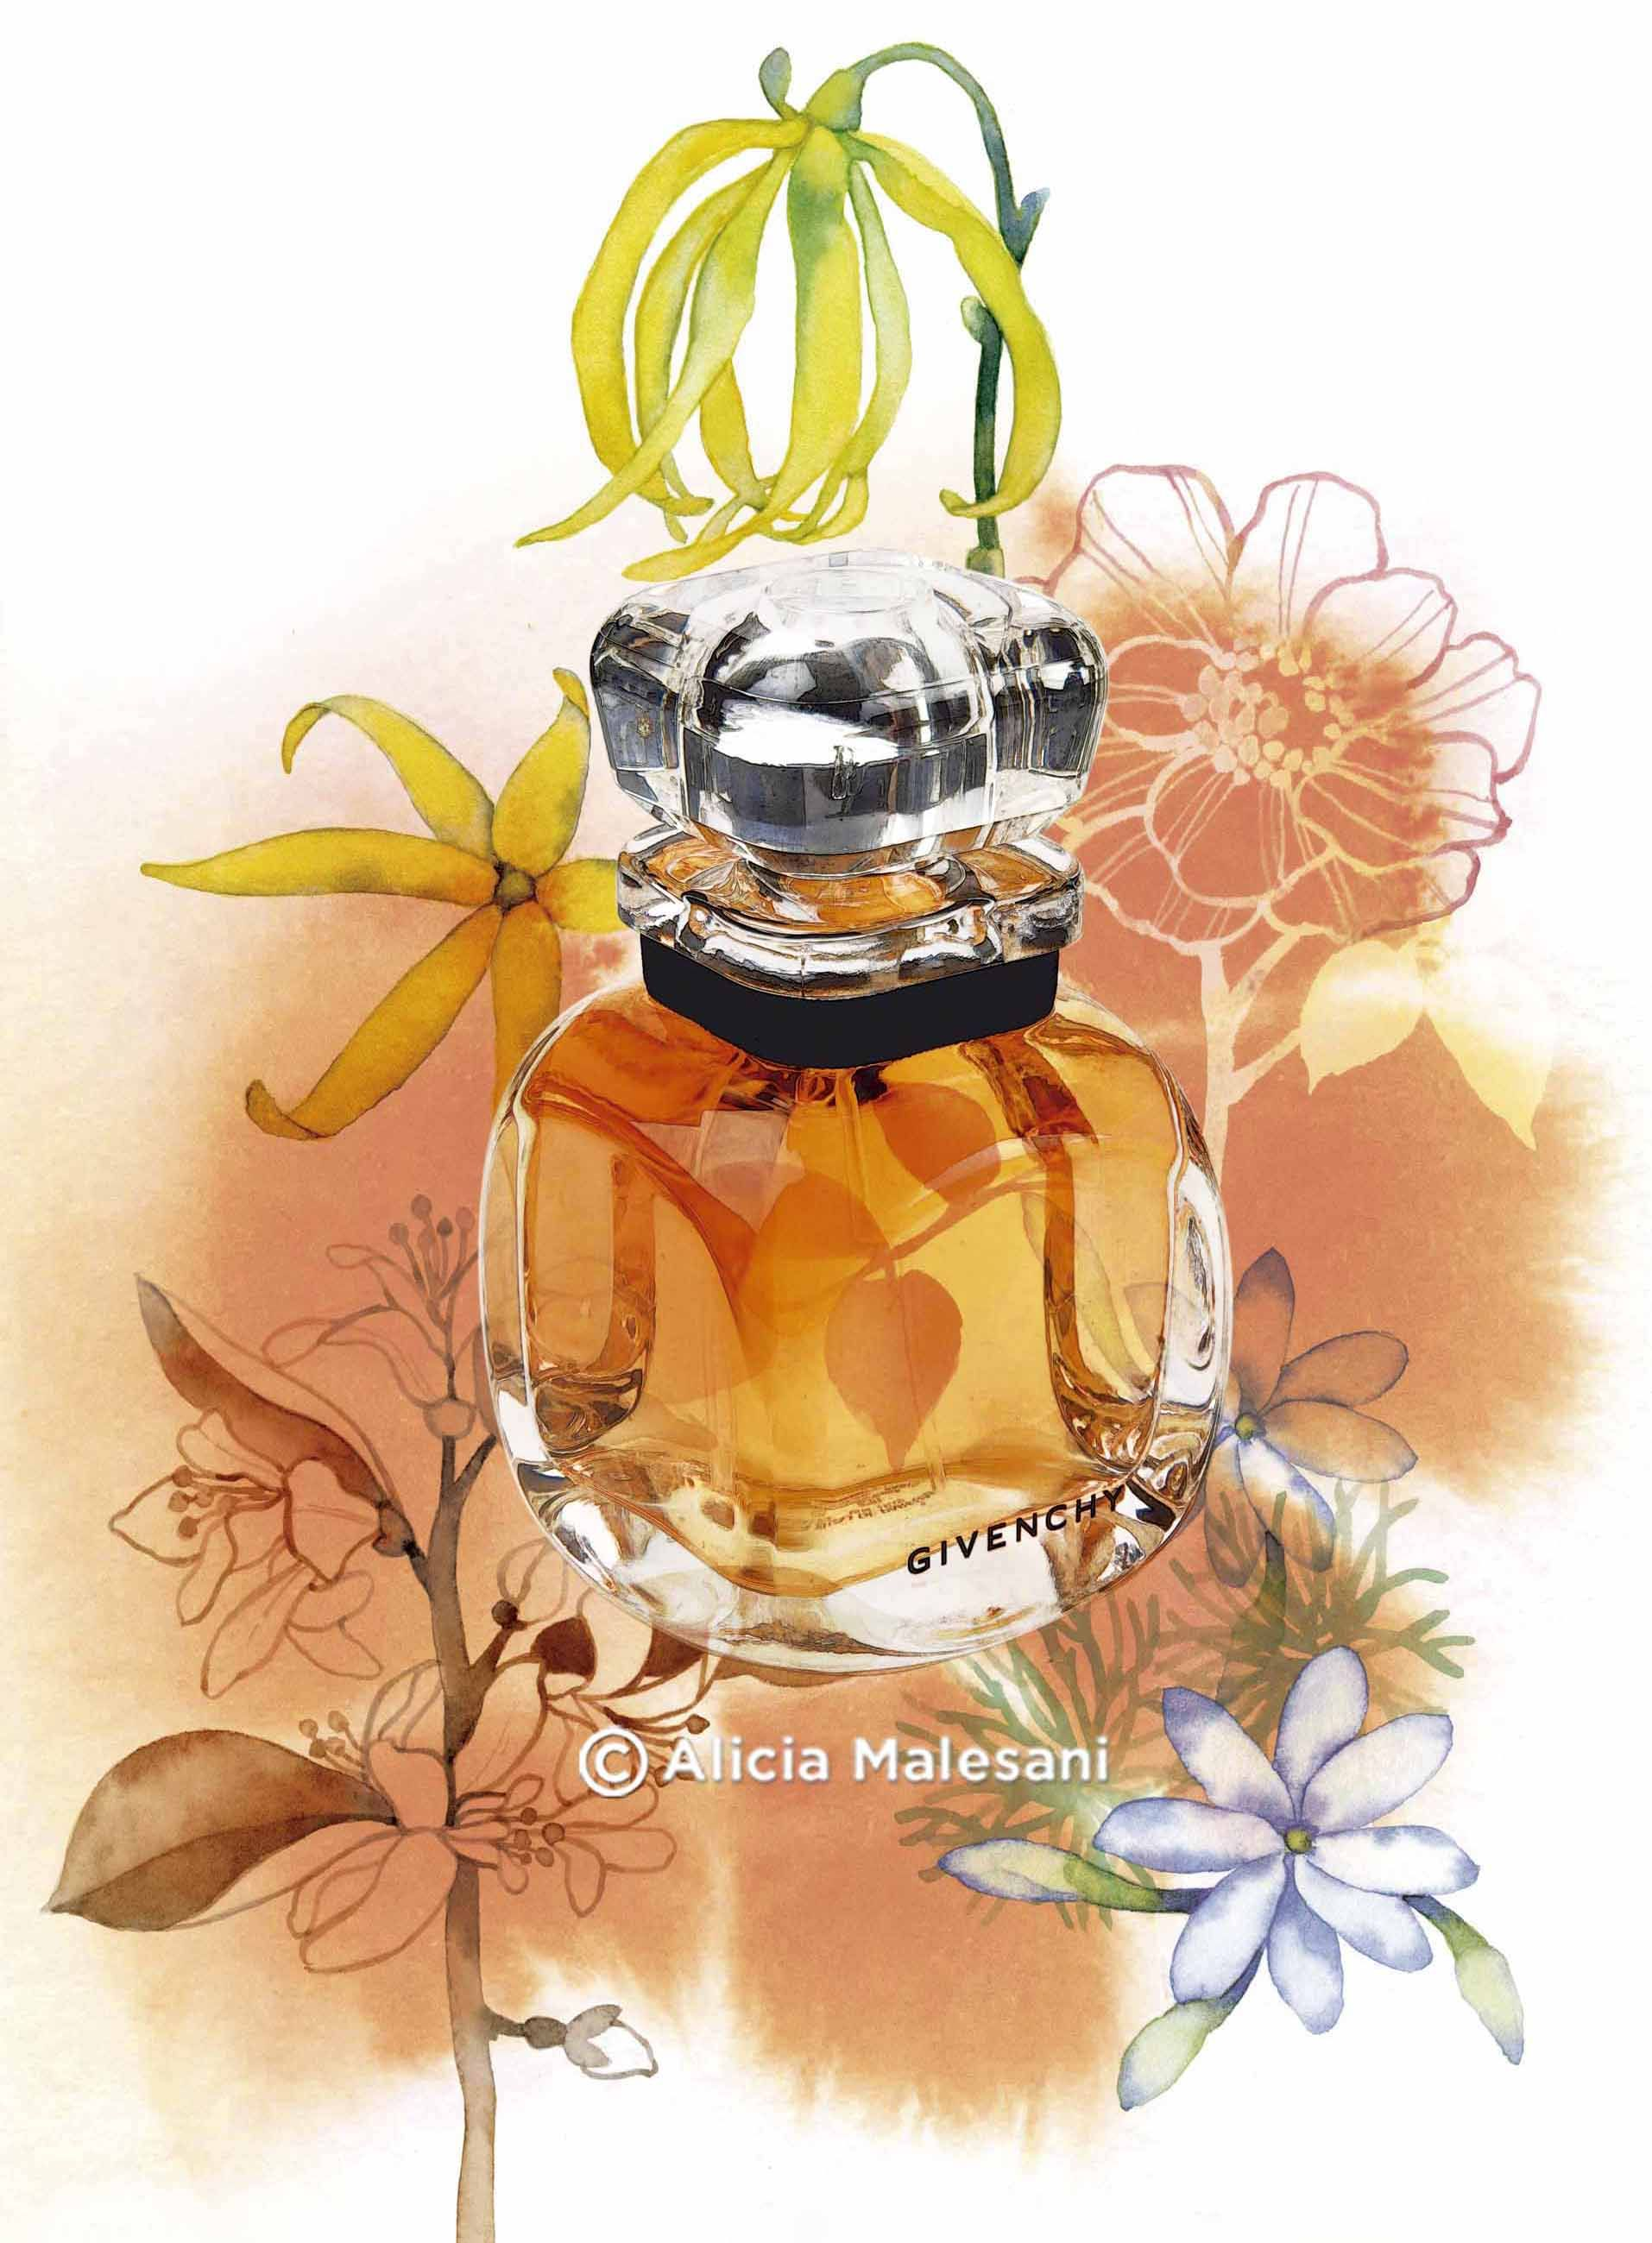 Perfumes Malesani Pinterest Perfume GivenchyAlicia qMGUVpSz